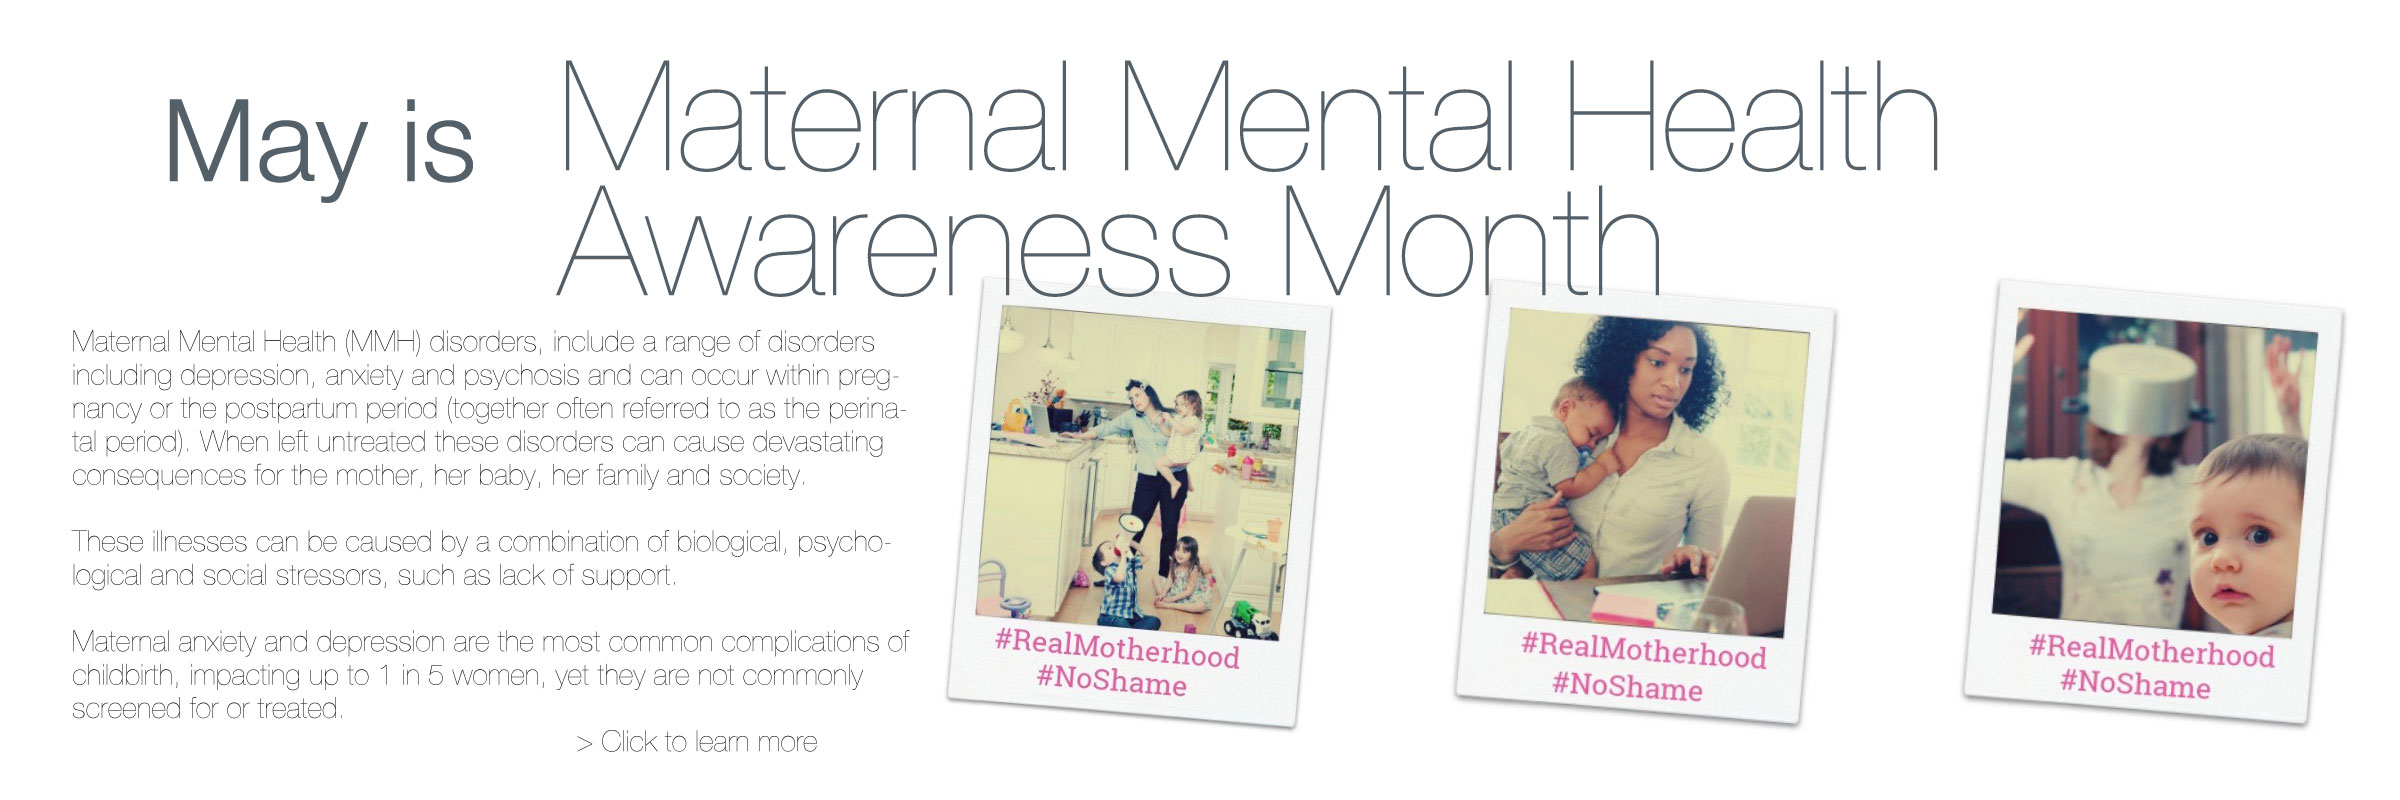 5-maternal-mental-health